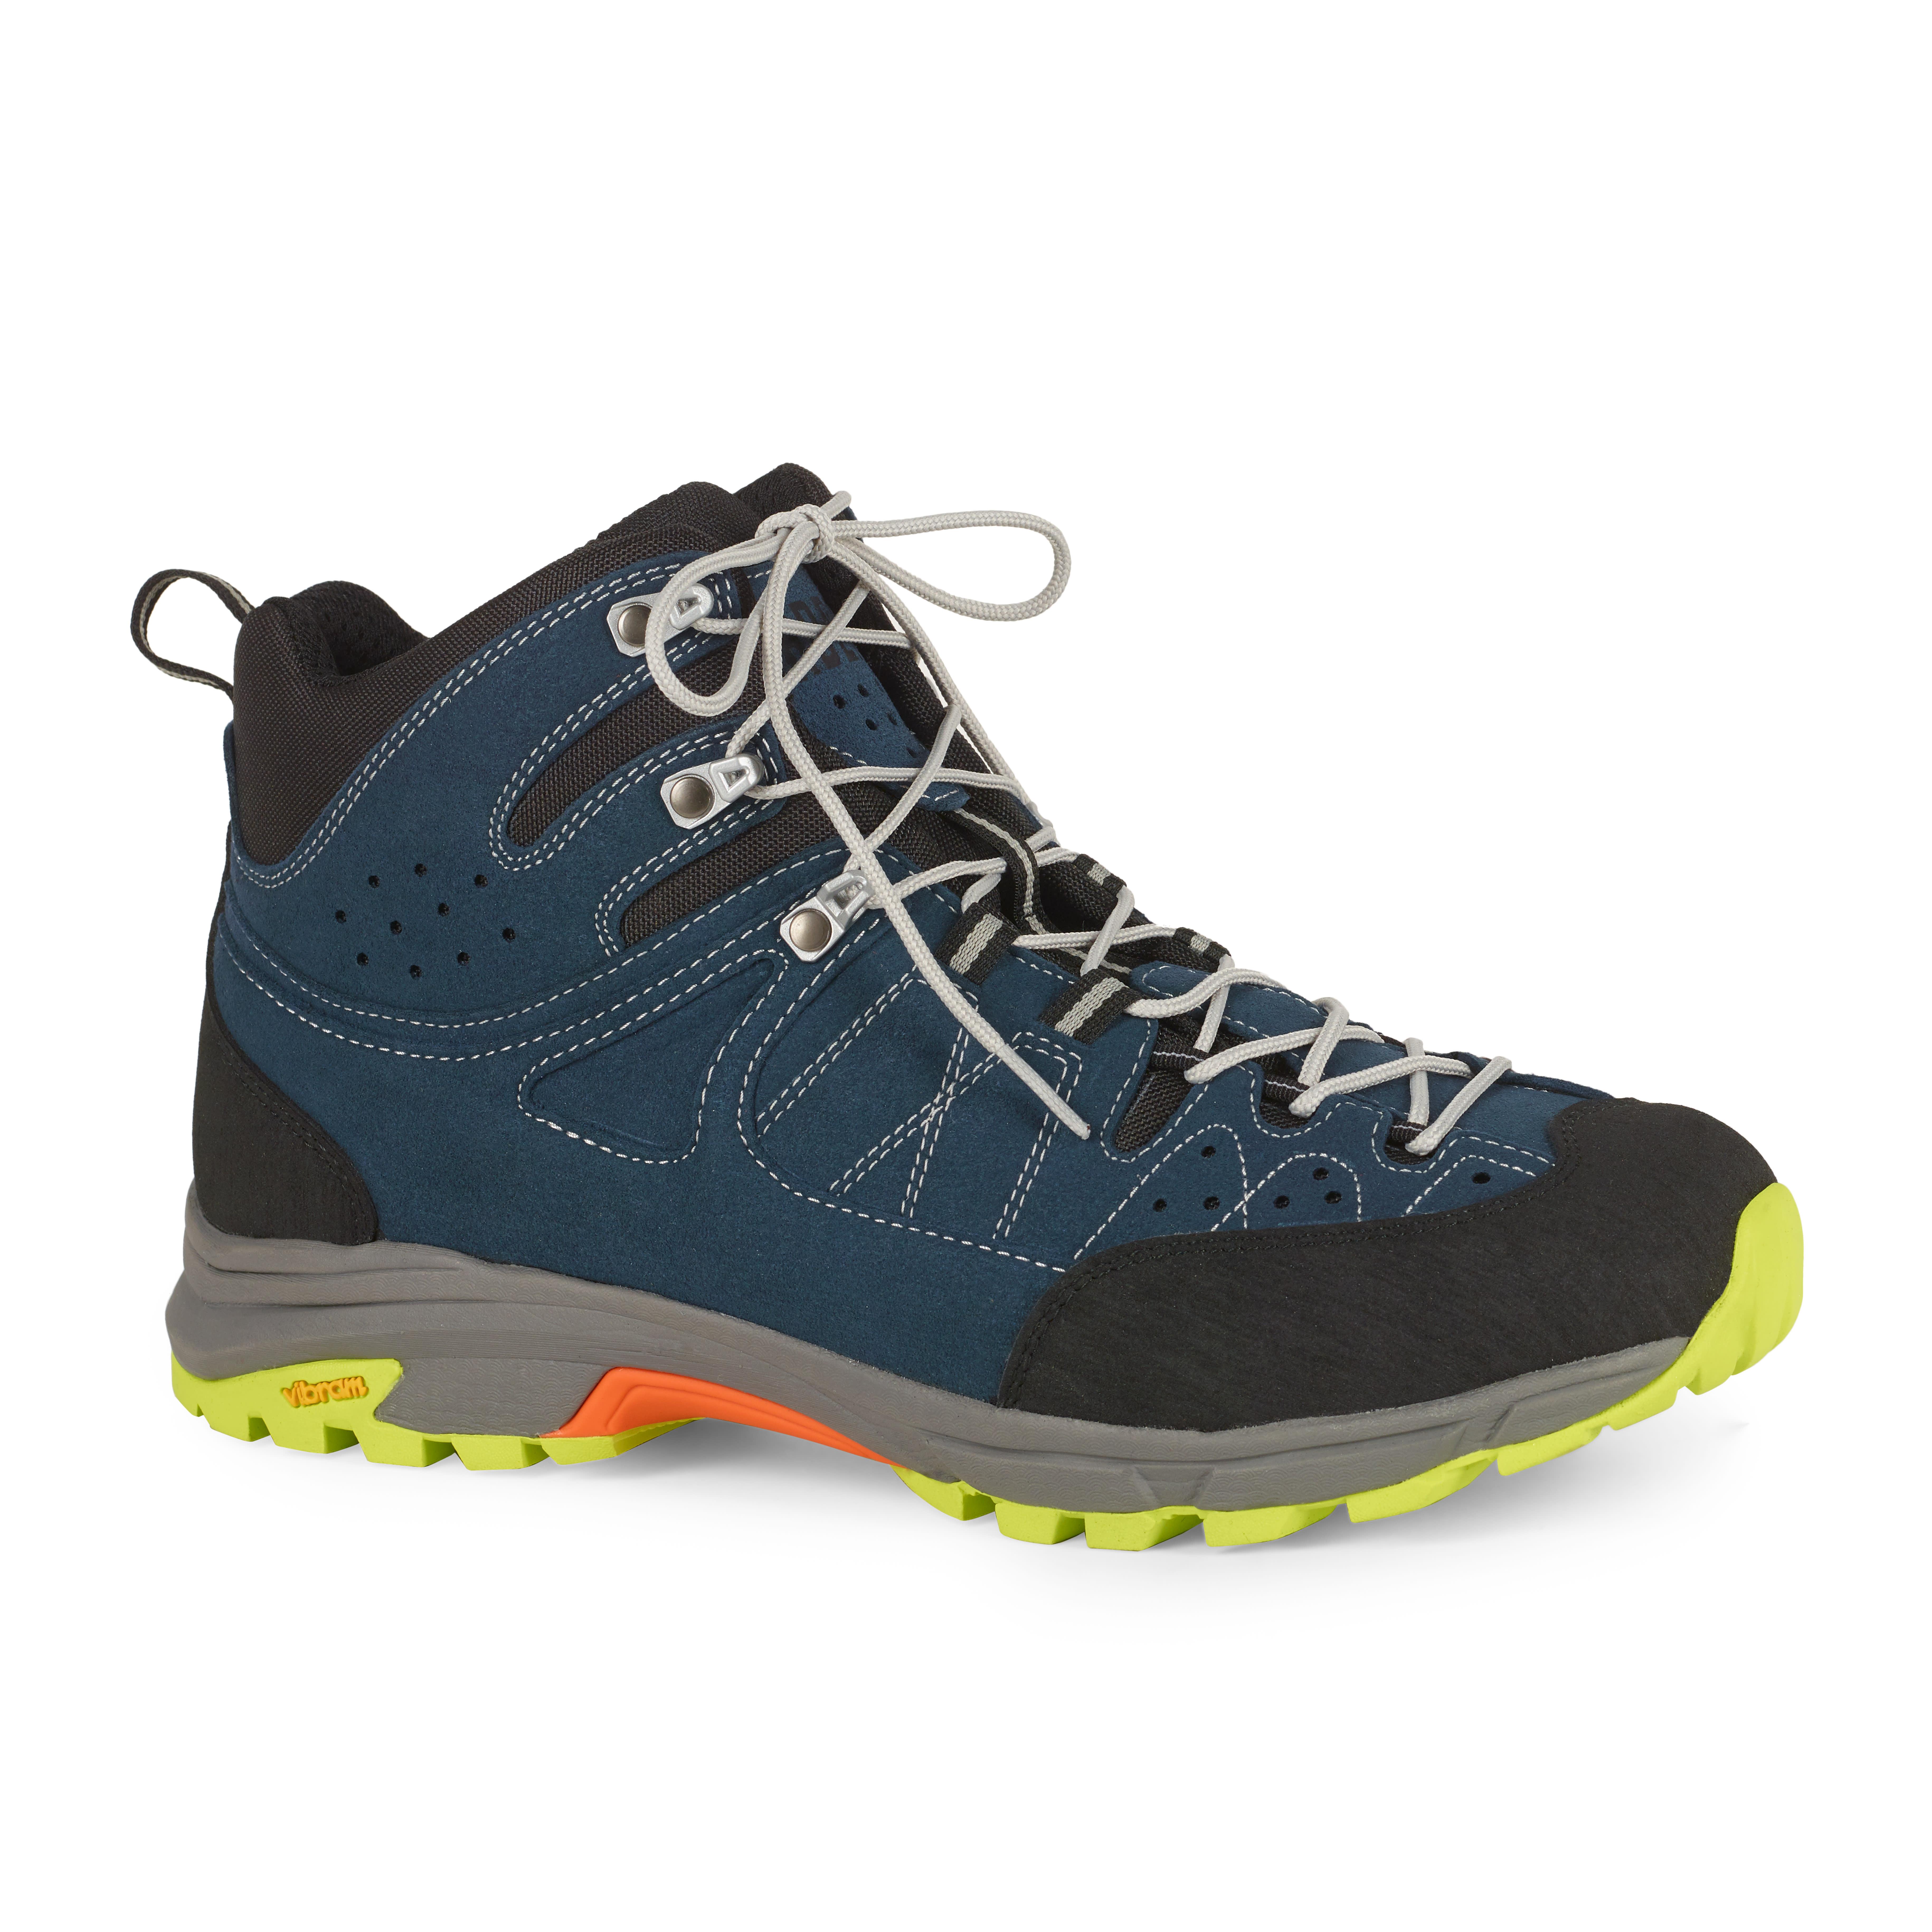 Fast Trek Men's Hiking Boot